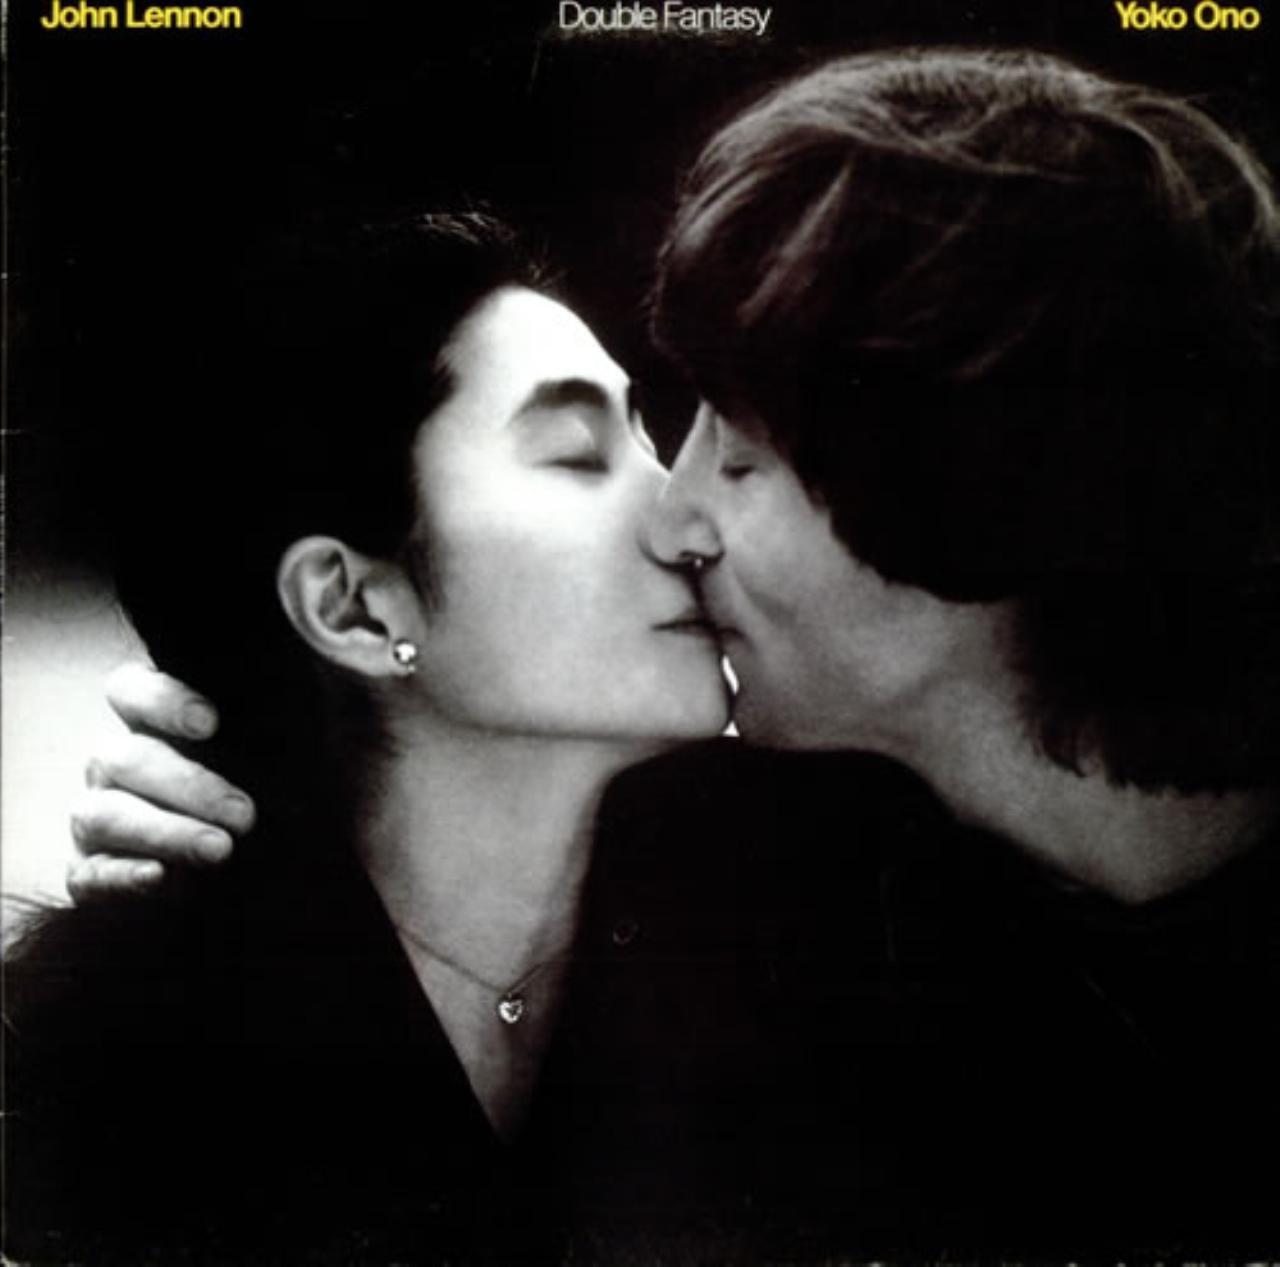 John Lennon Double Fantasy